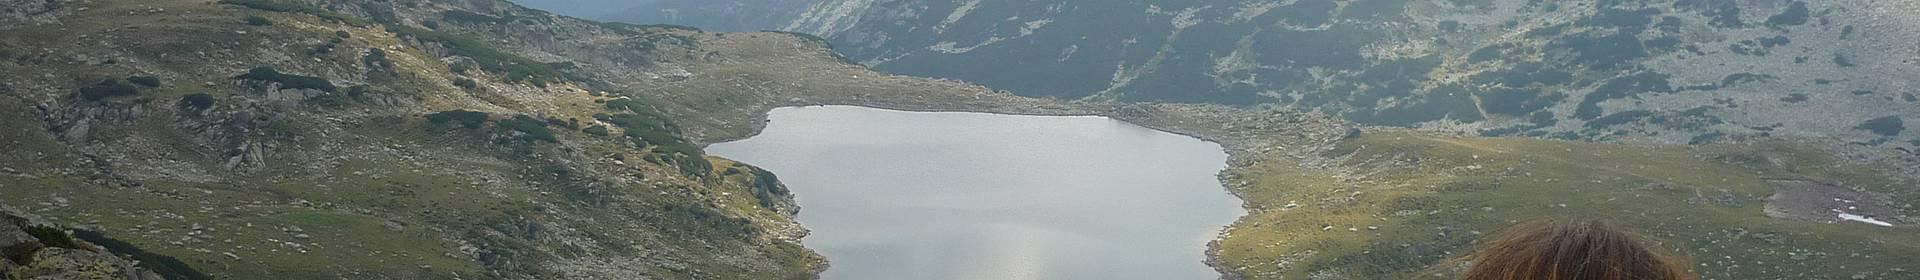 Les monts Rodna